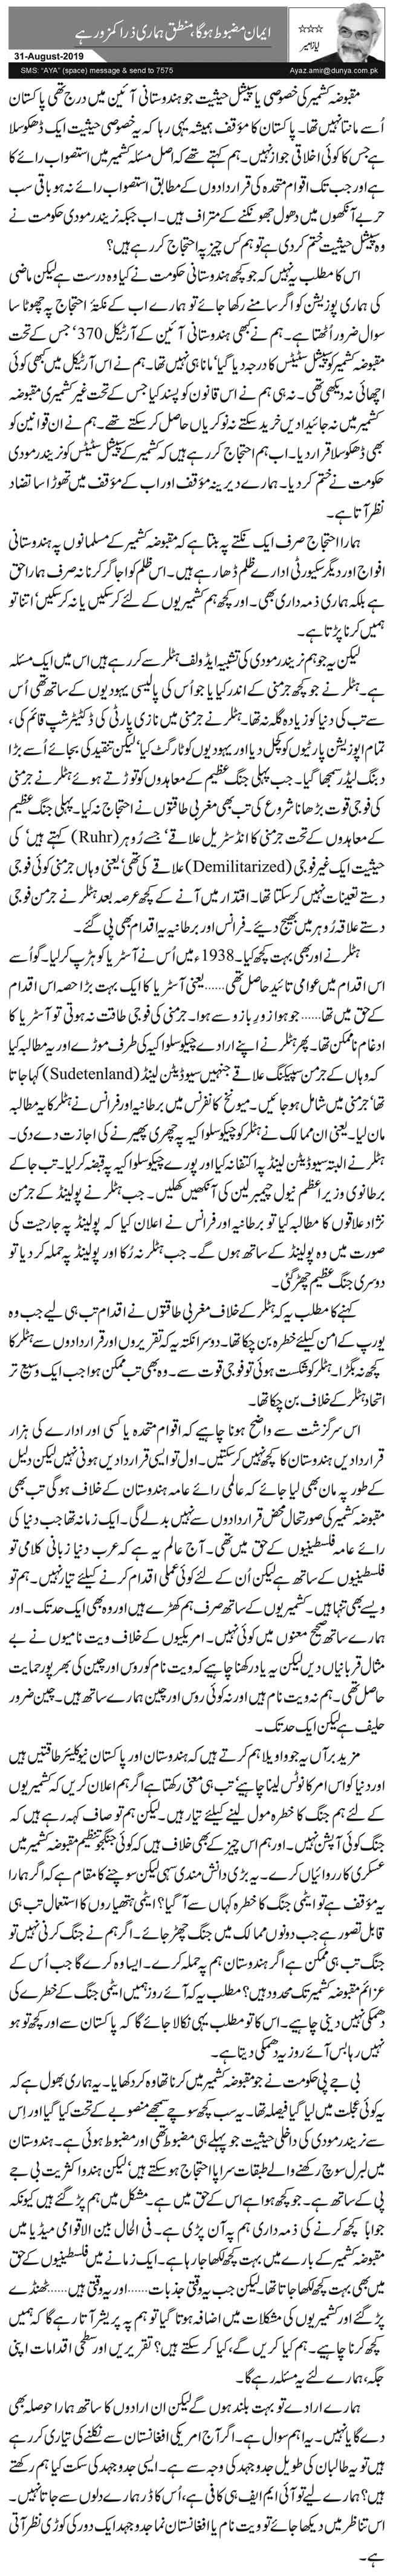 ayaz amir todya column dated:31 august 2019